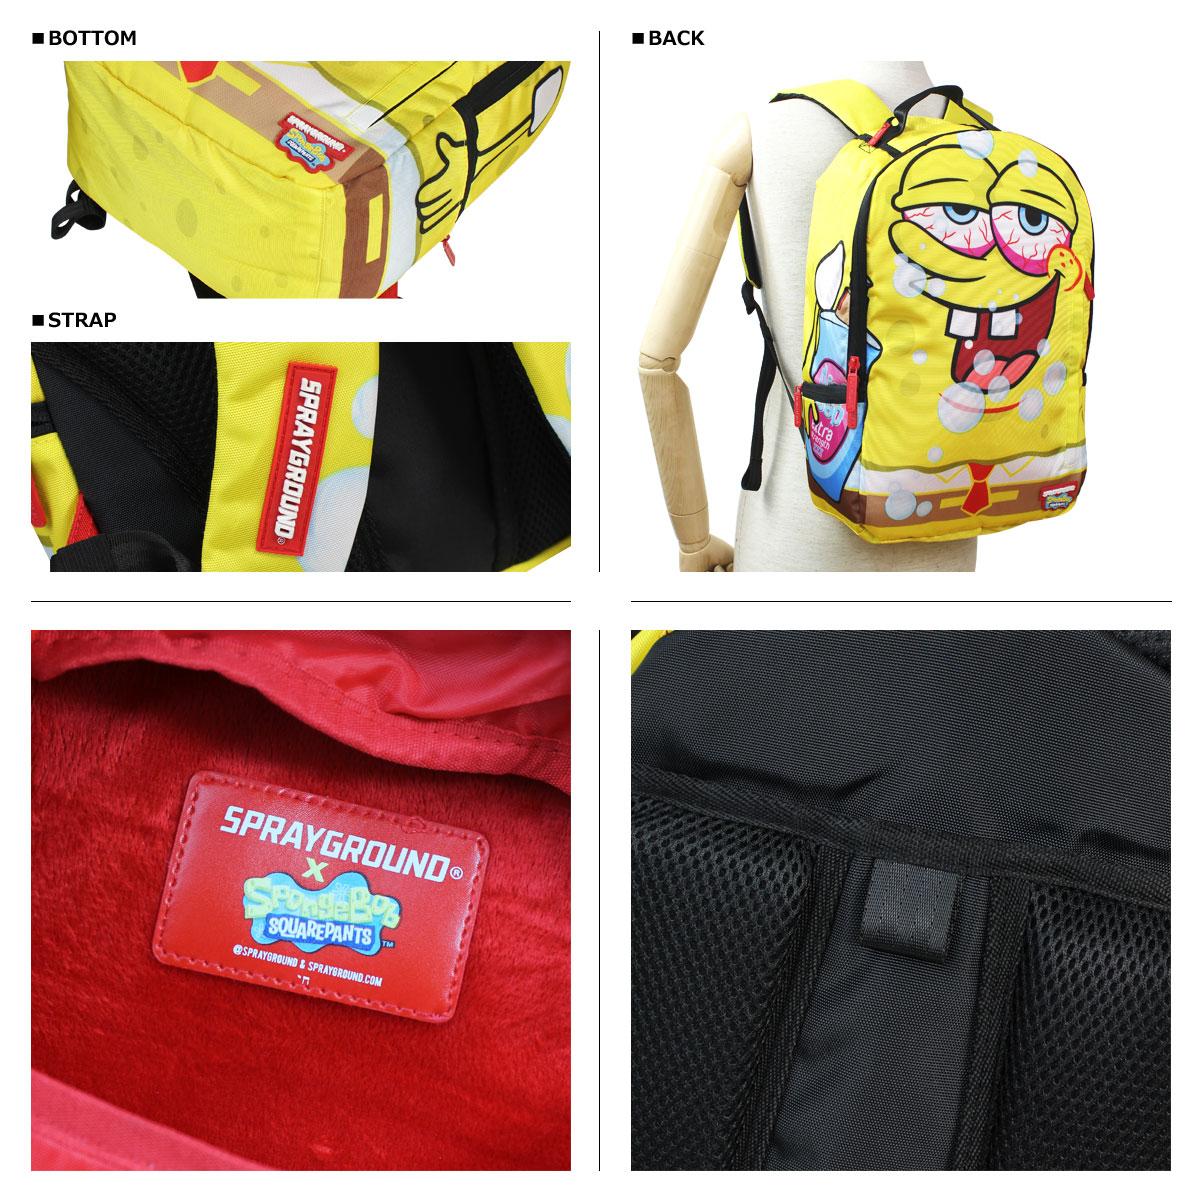 [SOLD OUT]噴霧器運動場SPRAY GROUND背包帆布背包B472 SPONGEBOB PARTYPANTS人分歧D